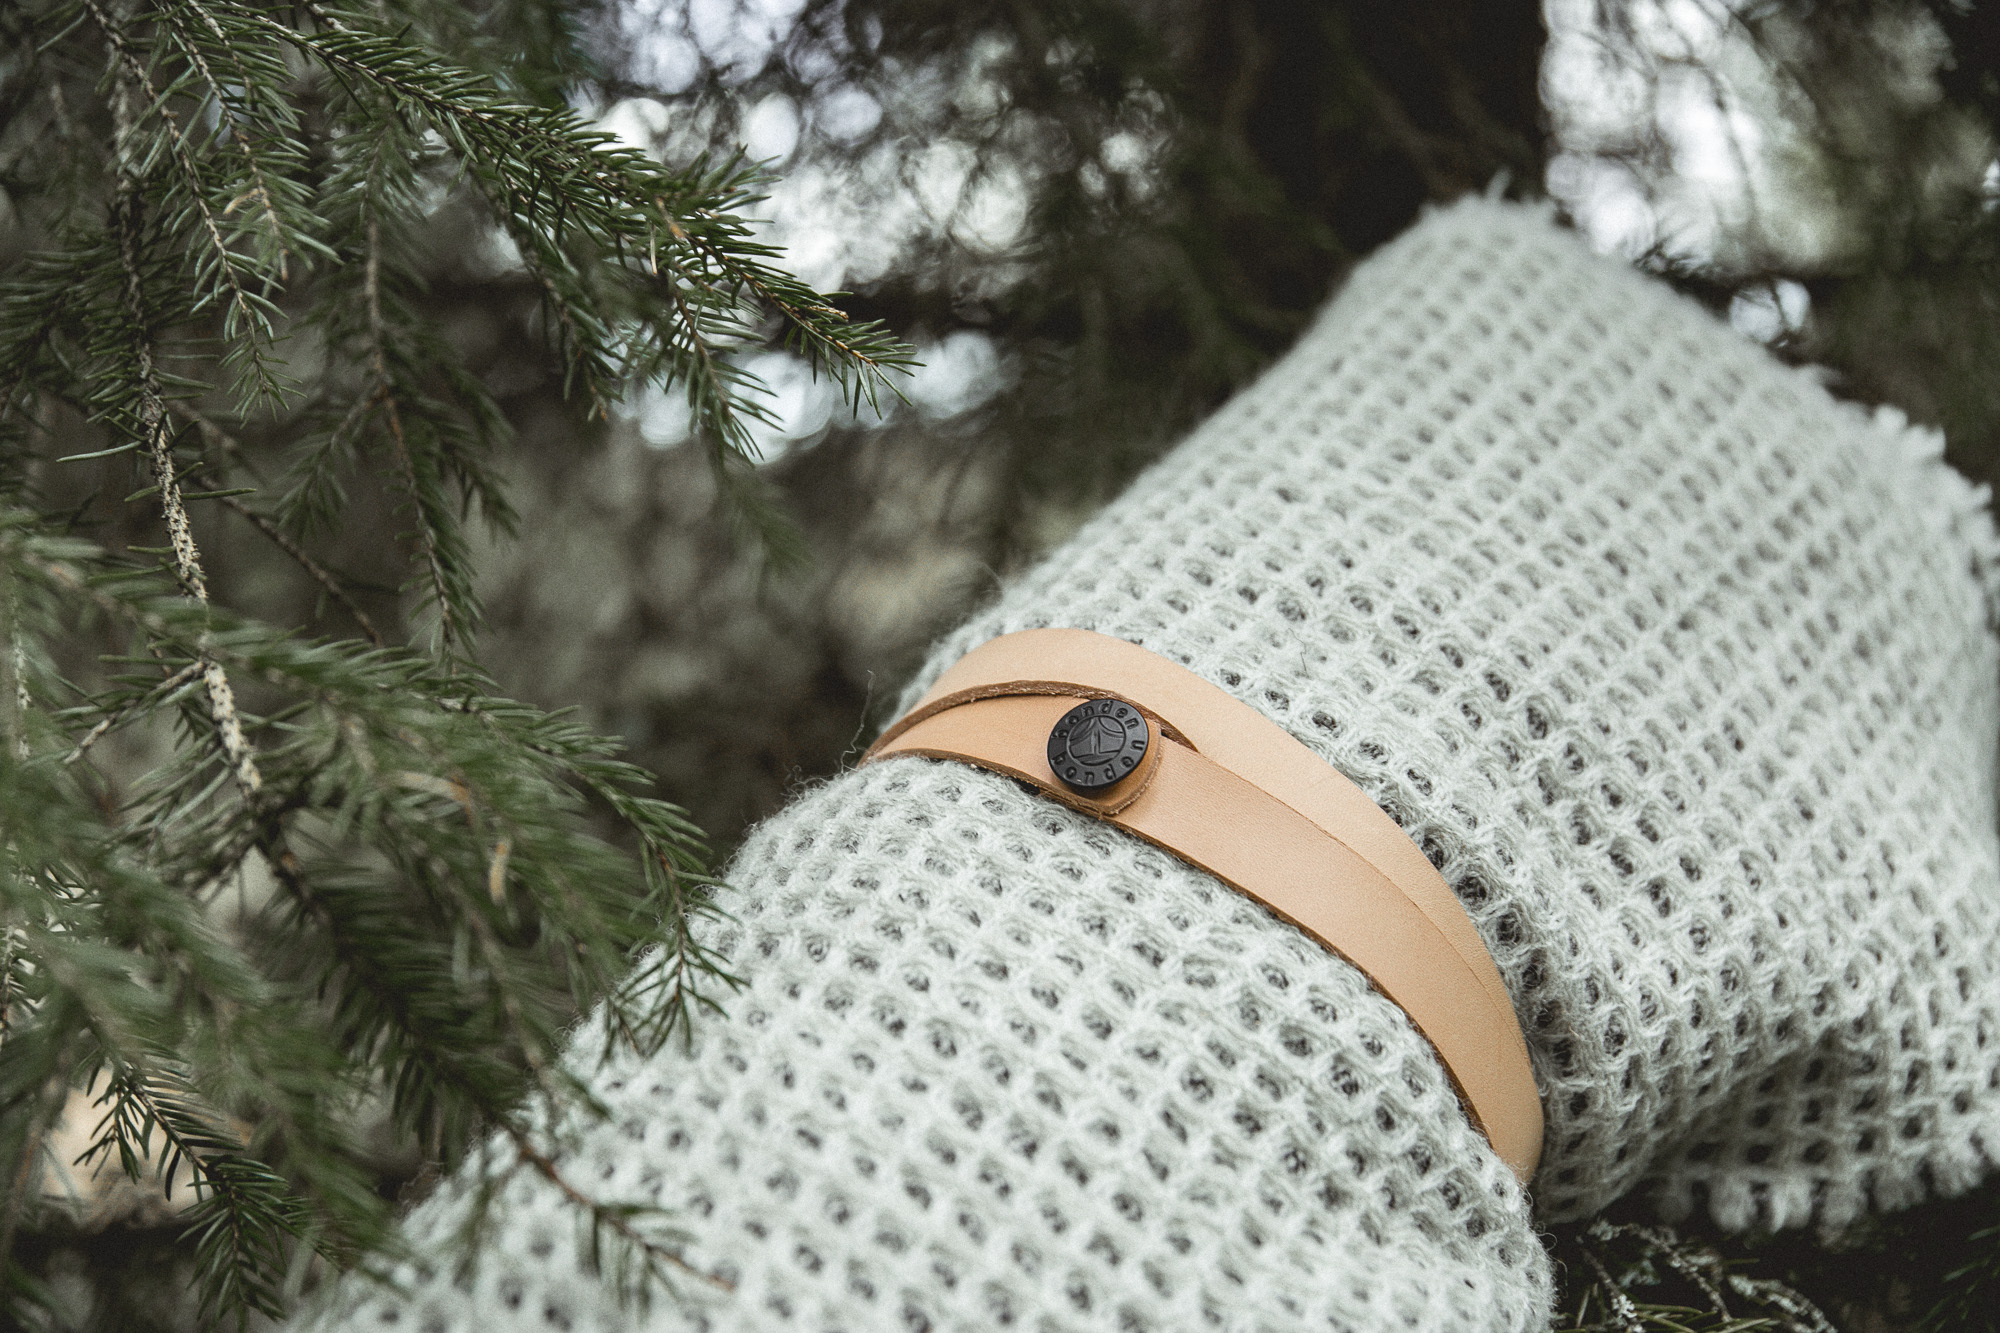 Thais FK X Bonden Living – A Sustainable Nordic Brand on The Adagio Blog